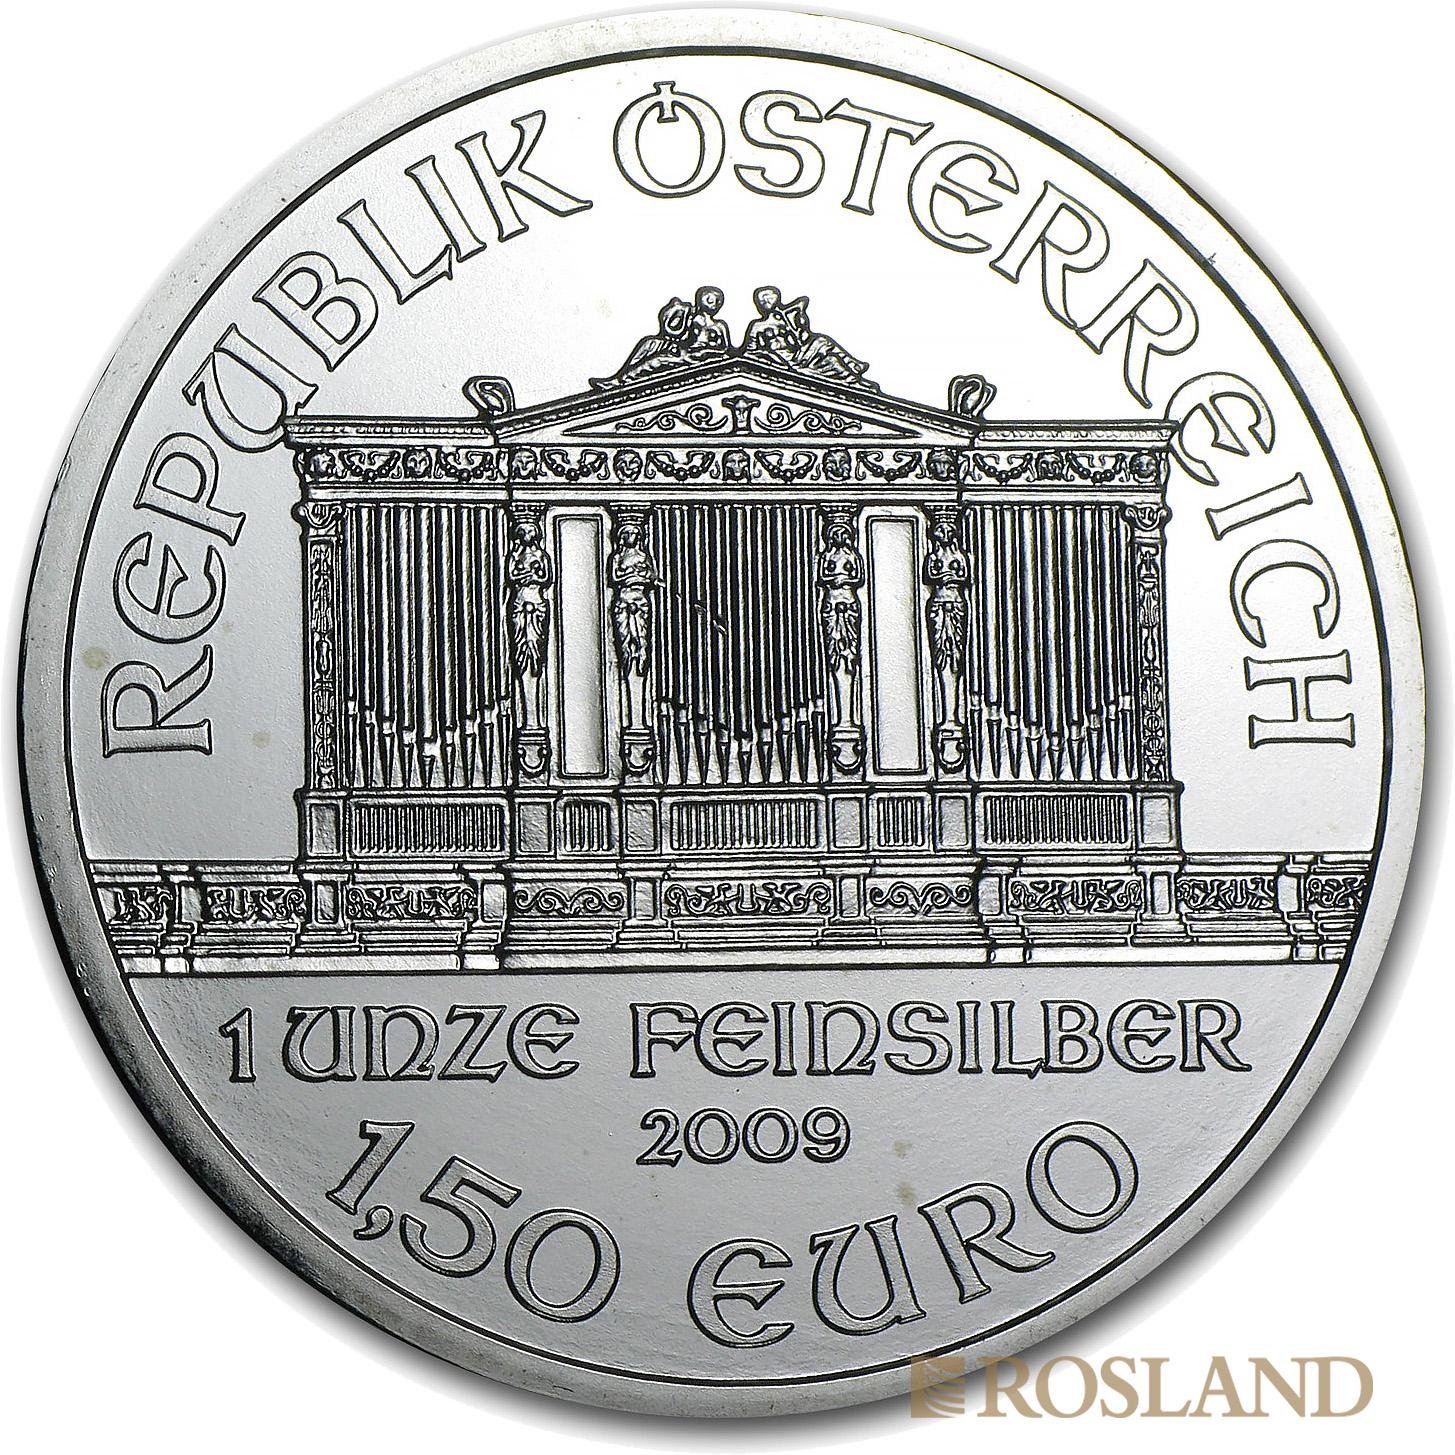 1 Unze Silbermünze Wiener Philharmoniker 2009